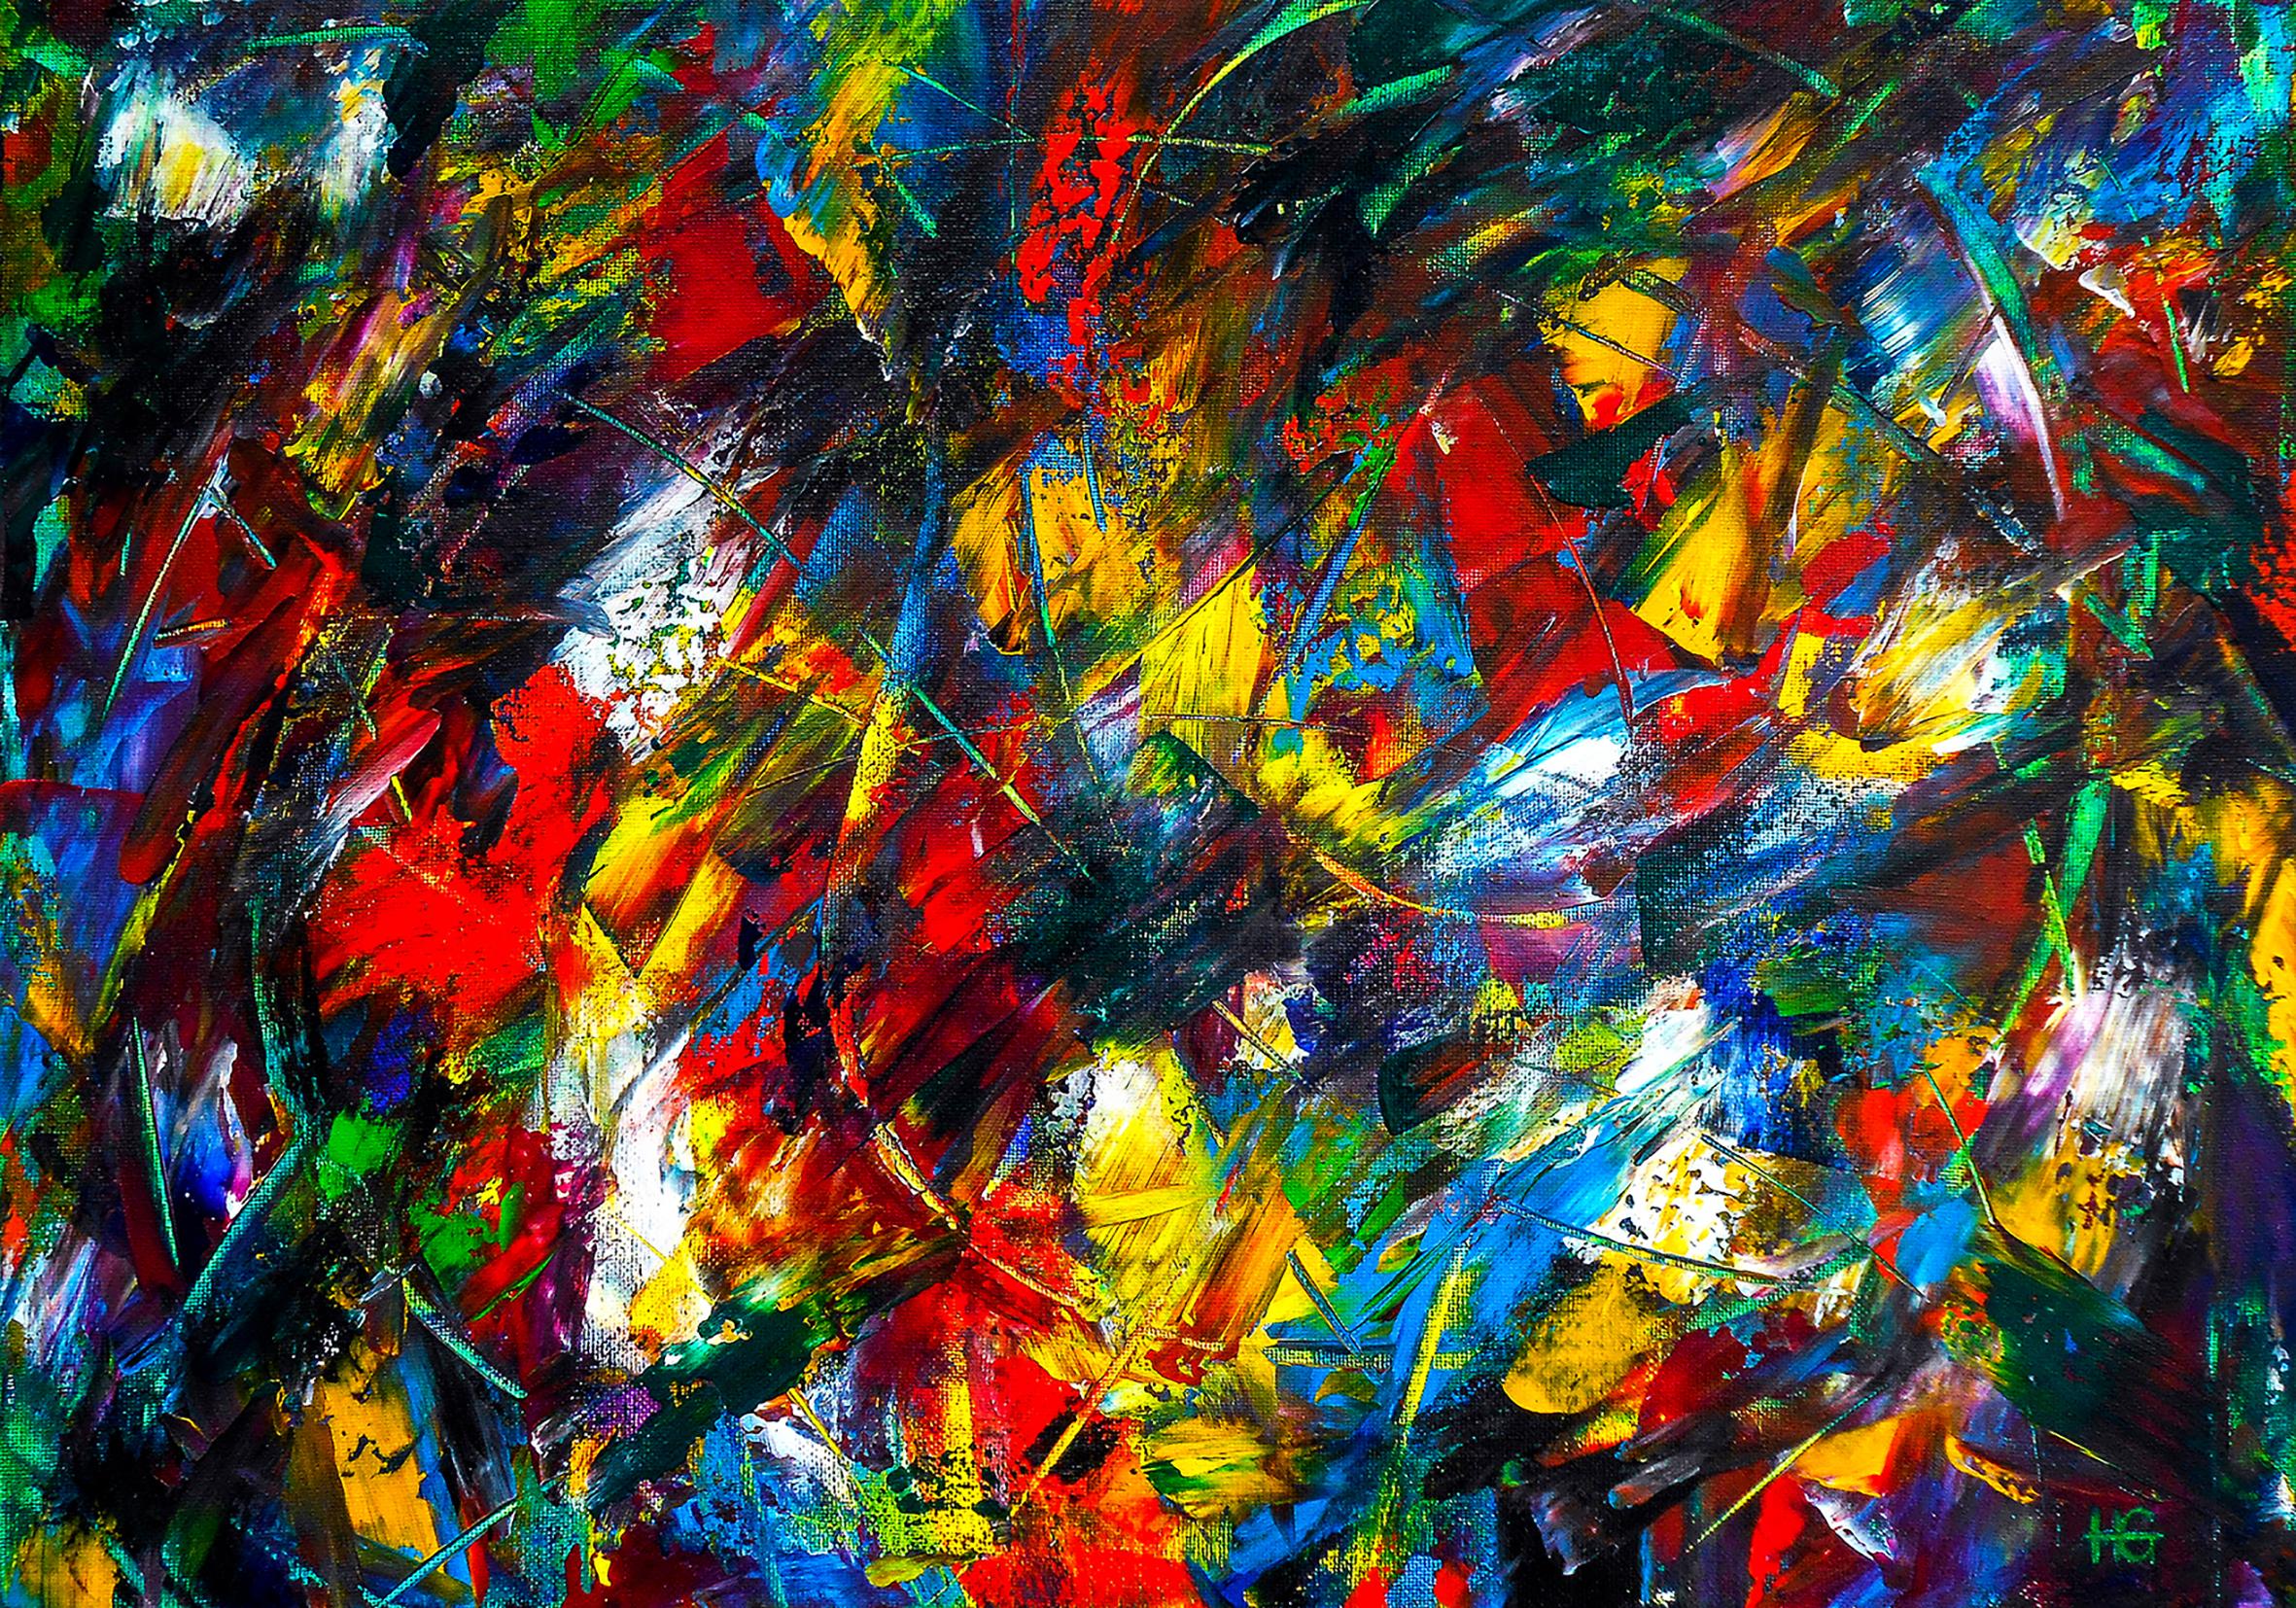 The Perky Painter